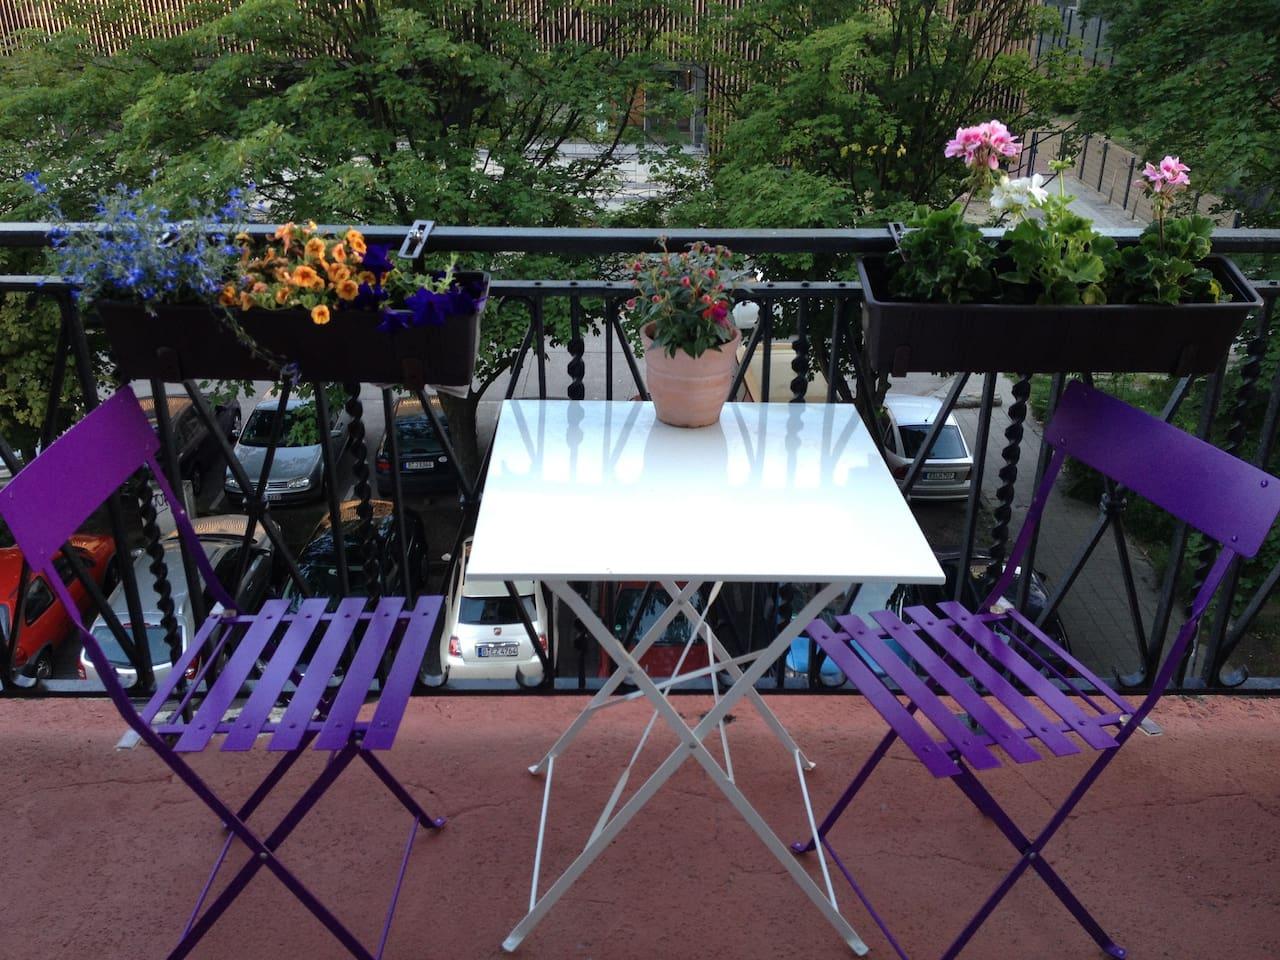 Balcony-quiet backstreet